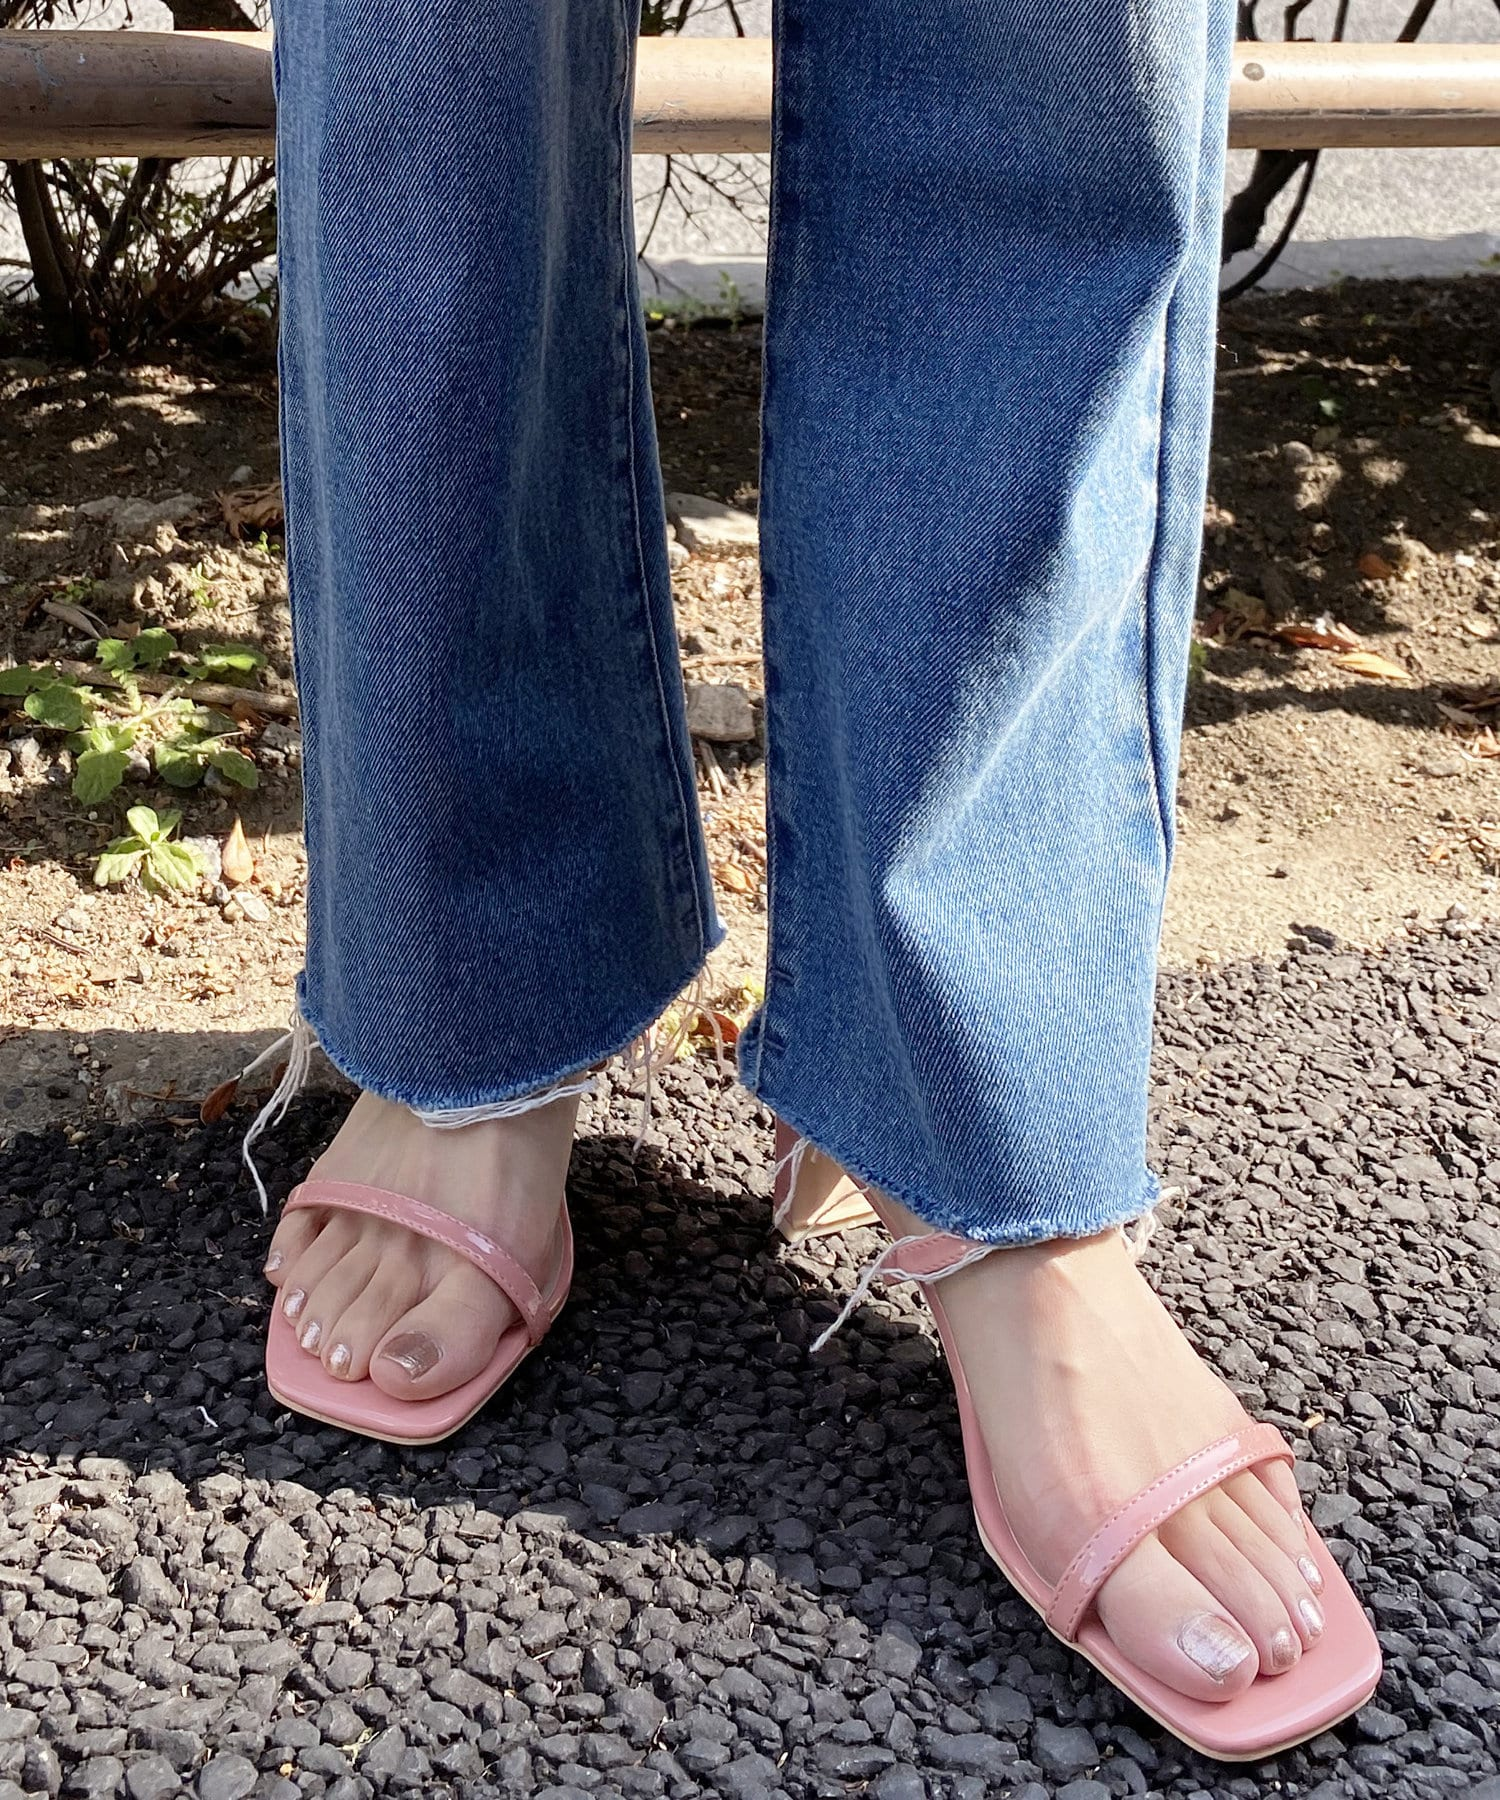 natural couture(ナチュラルクチュール) レディース グミカラーヌーディーサンダル ピンク系その他